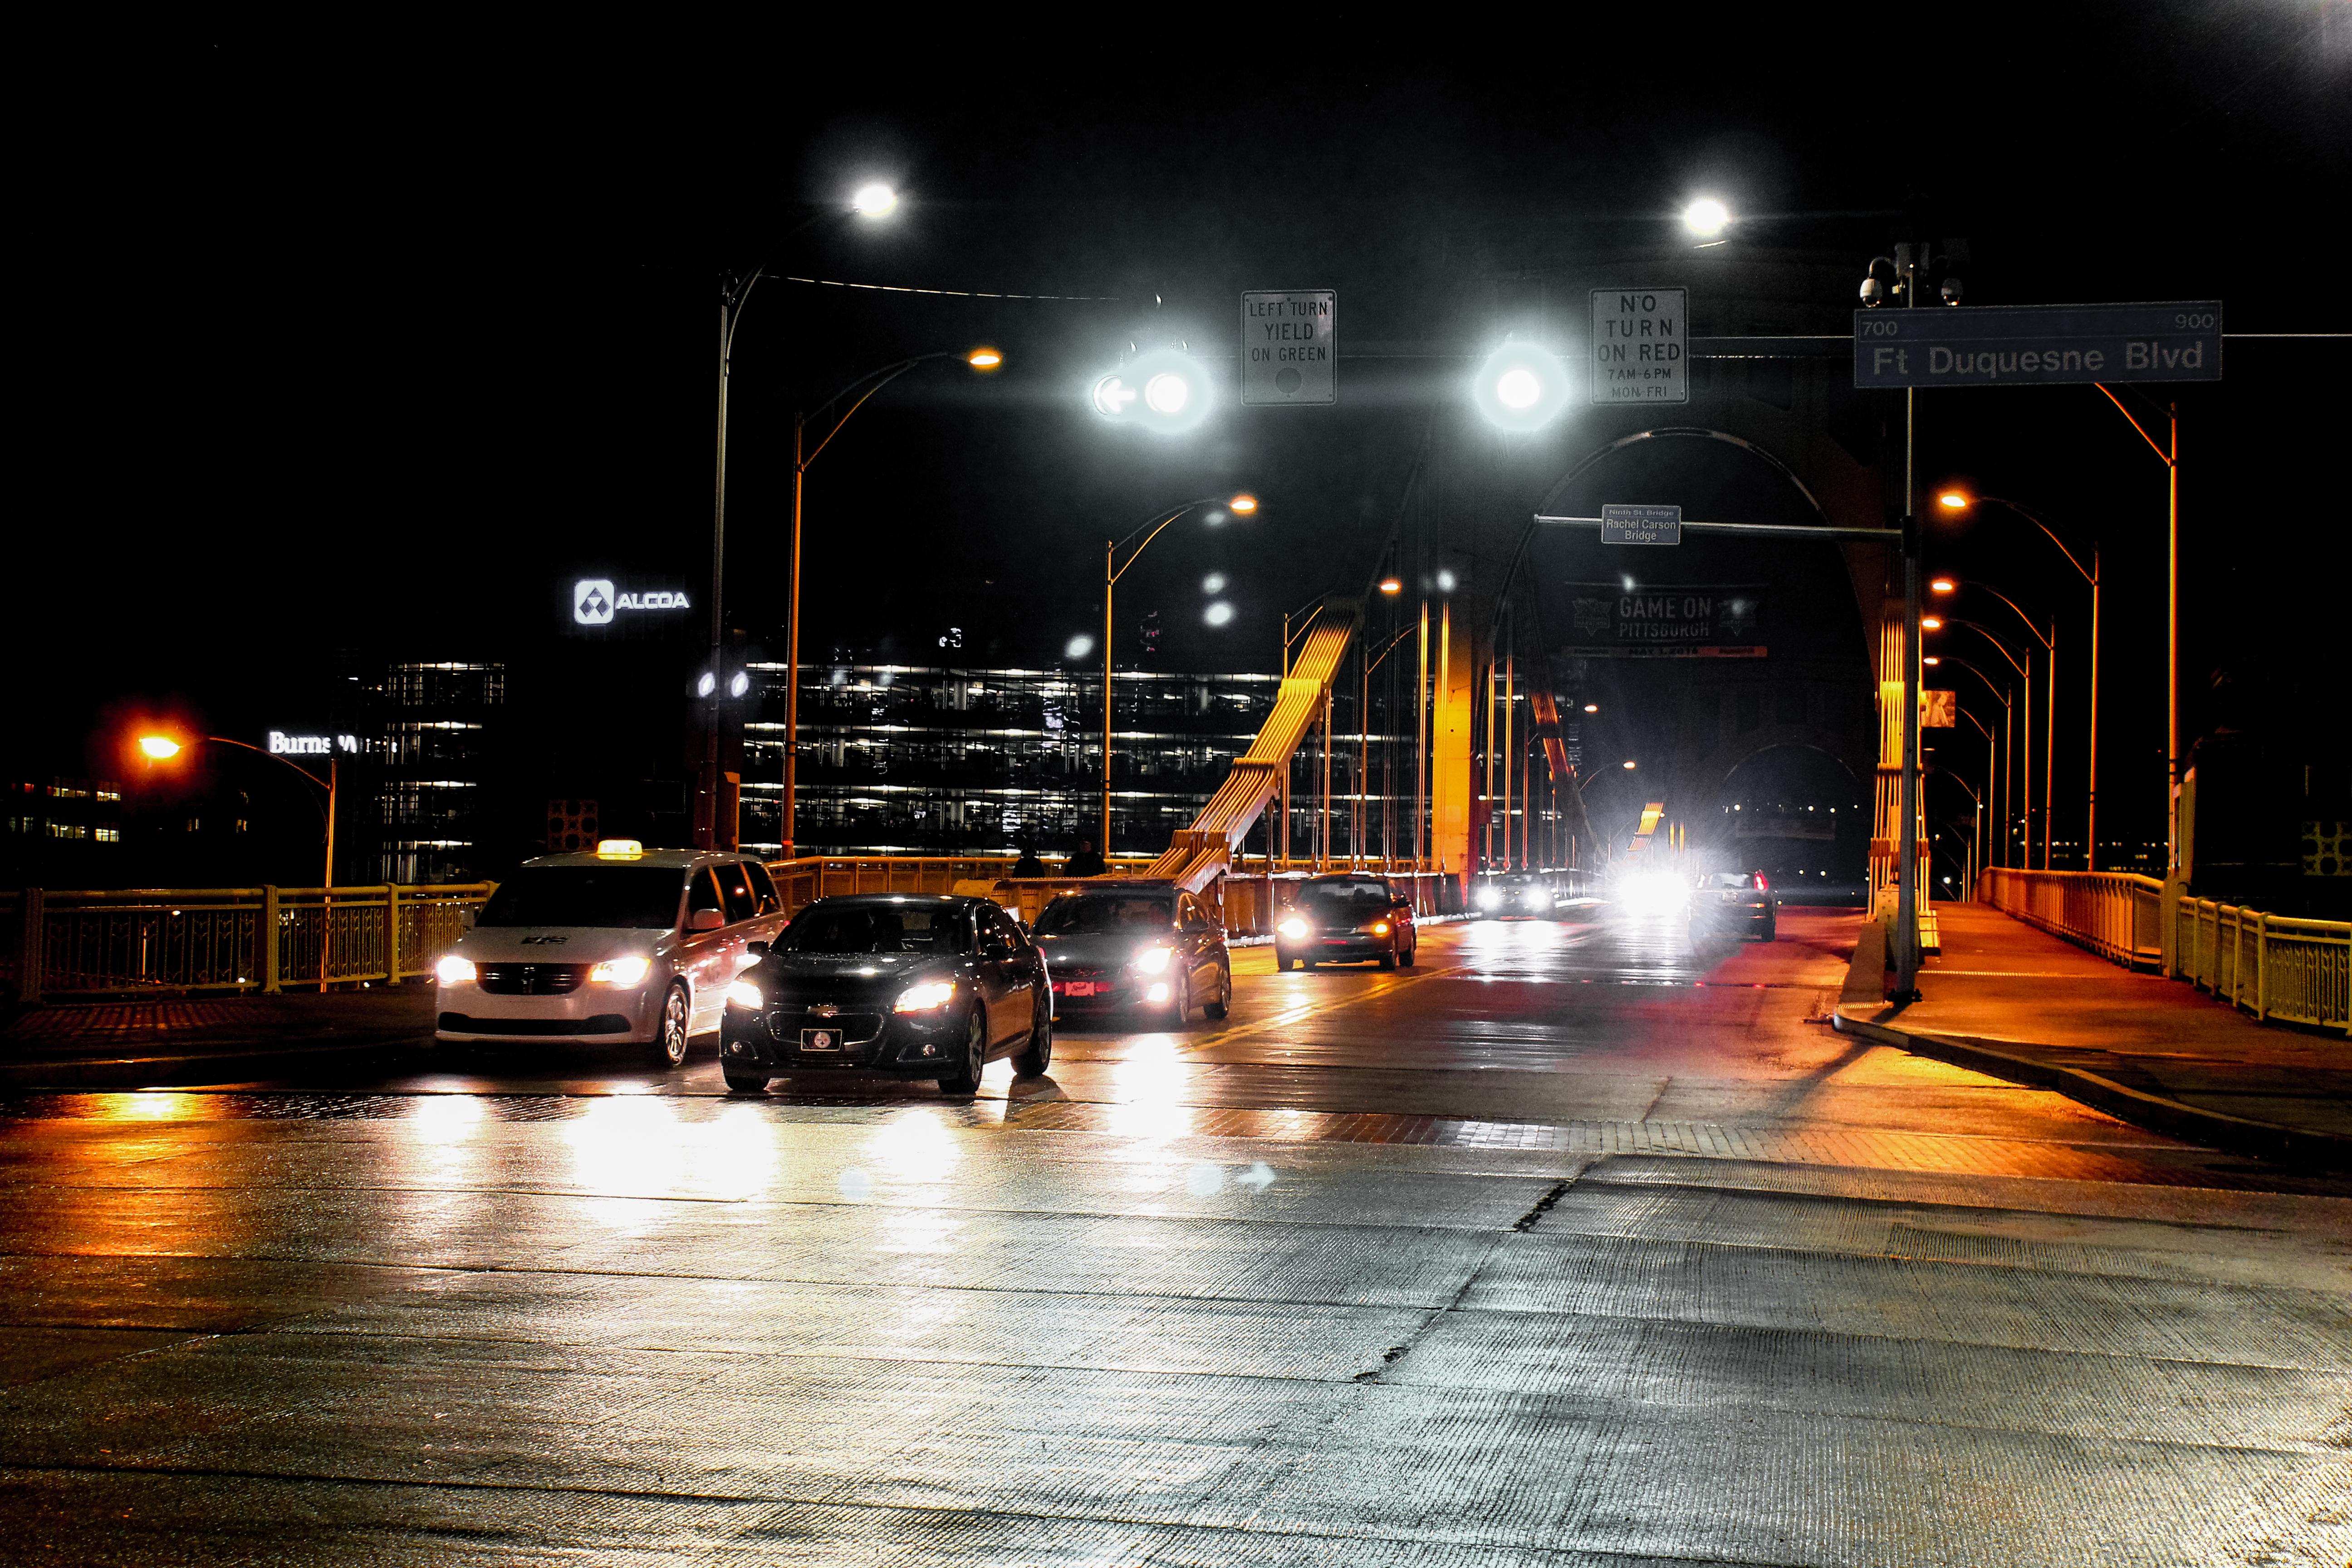 Gambar Cahaya Jembatan Pemandangan Kota Kegelapan Lampu Jalan